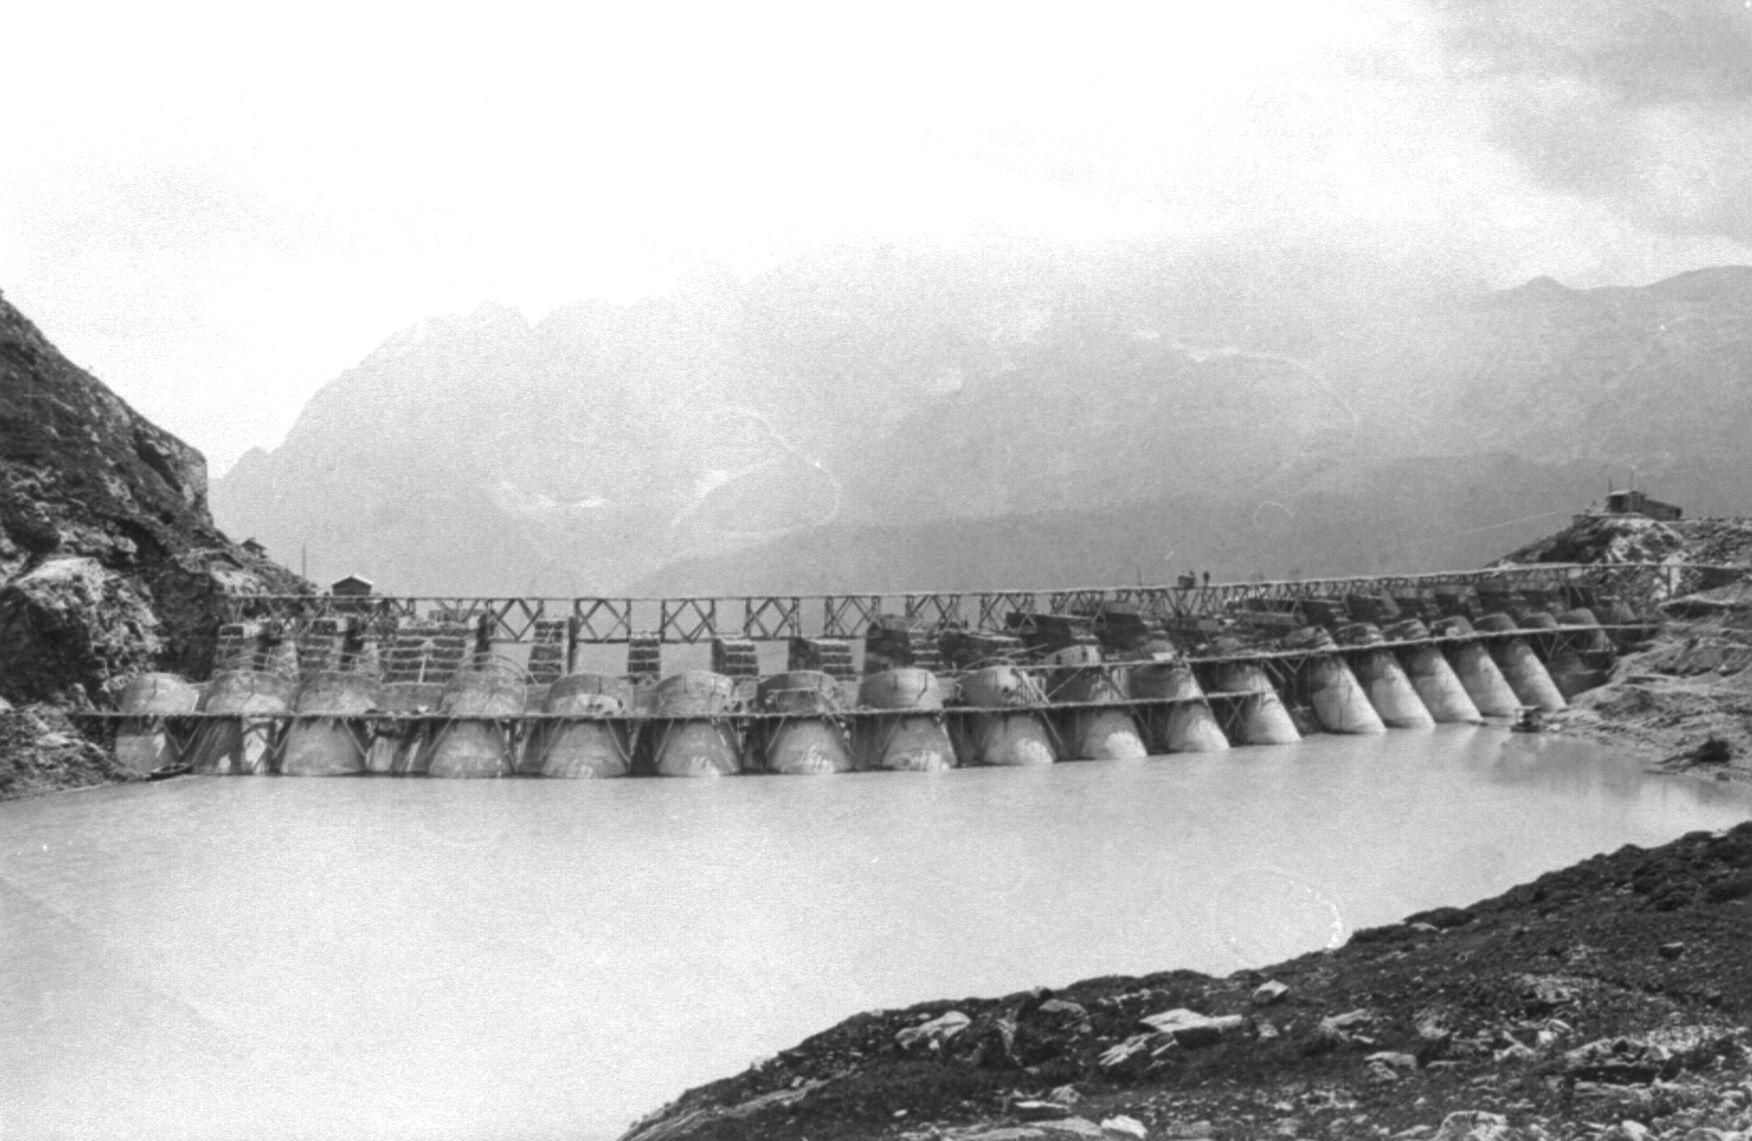 Piloni ed archi visti dal bacino